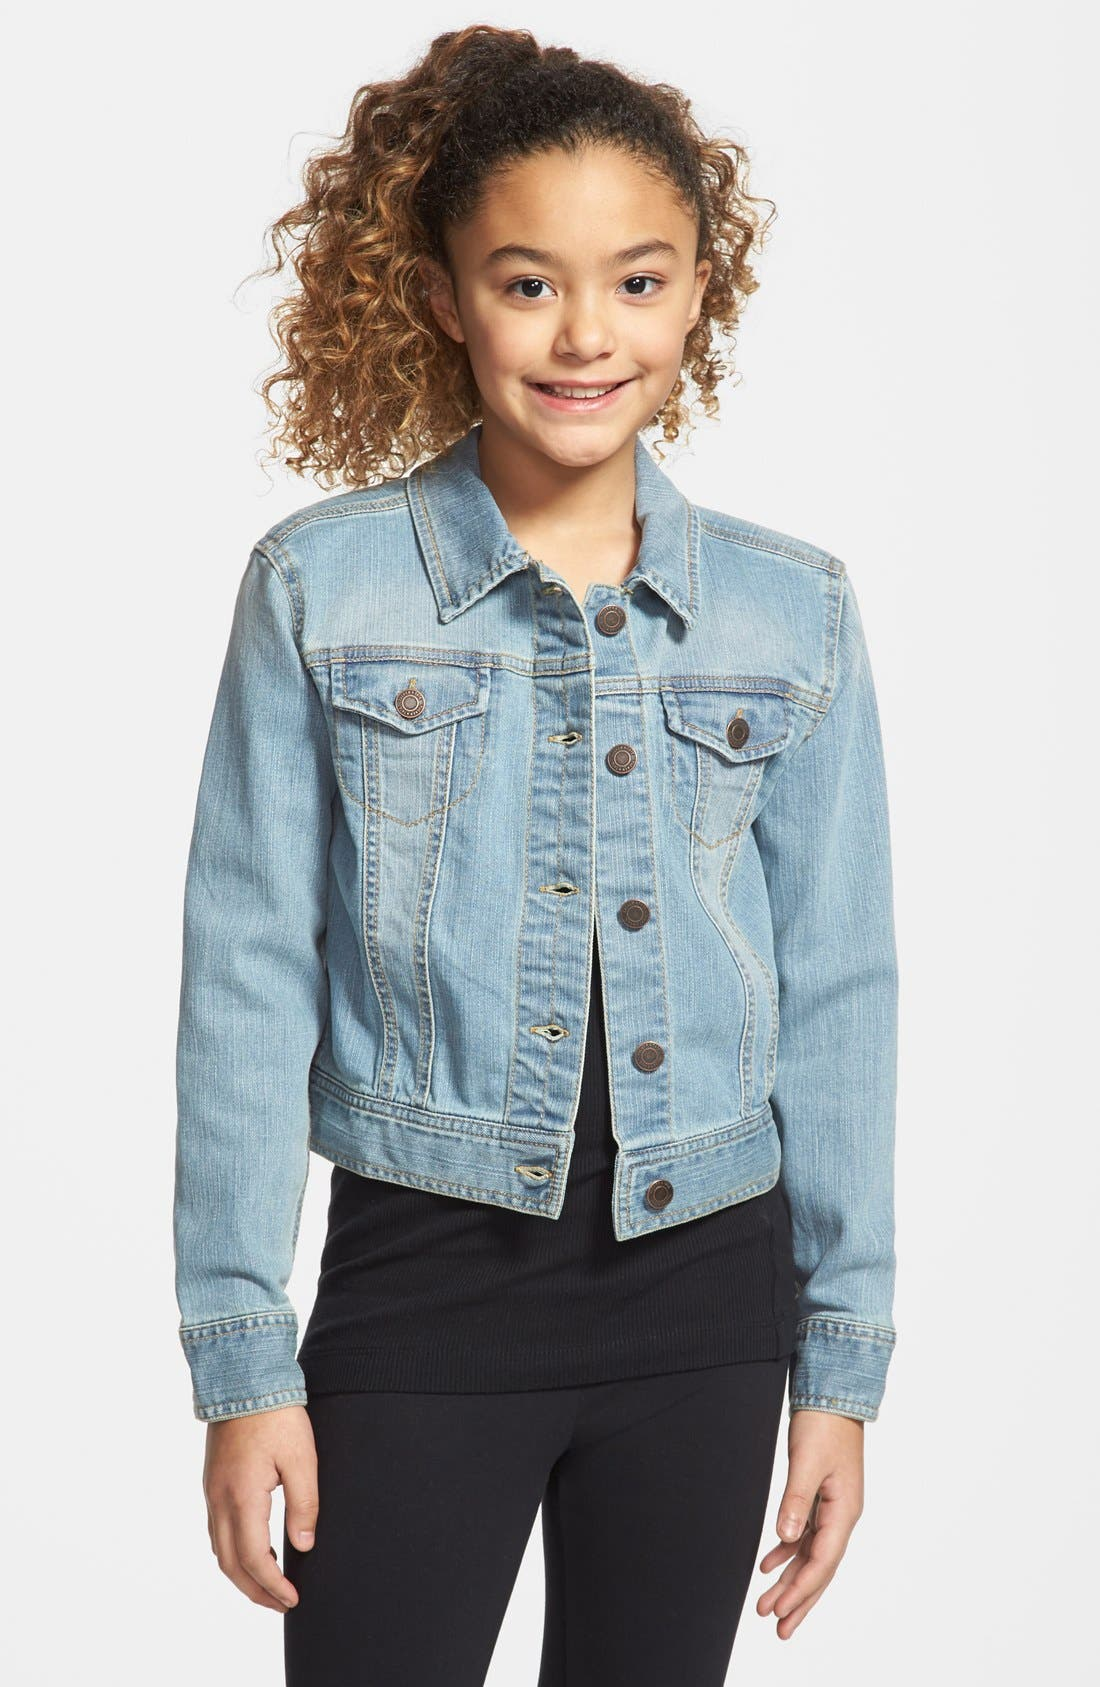 Alternate Image 1 Selected - Tucker + Tate Denim Jacket (Little Girls & Big Girls)(Online Only)